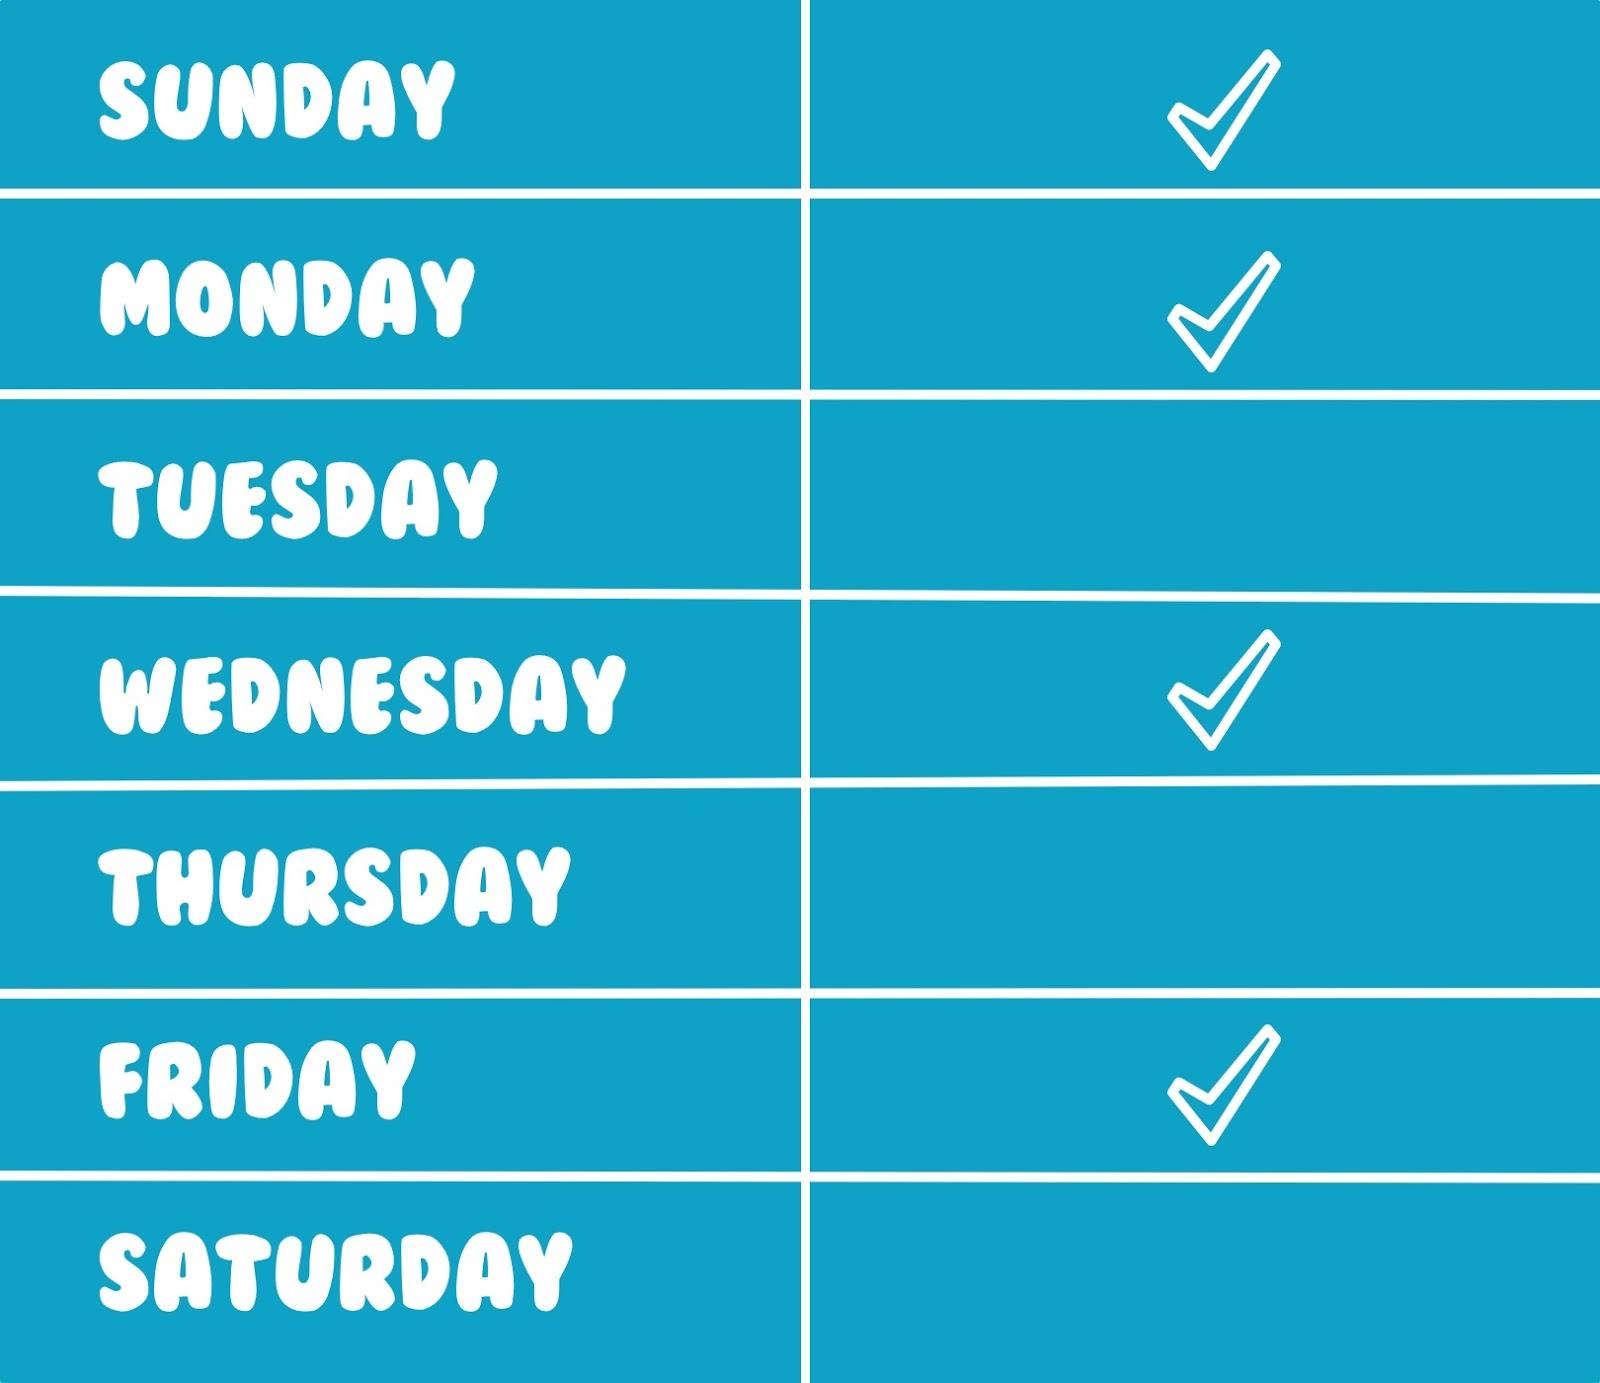 posting schedule